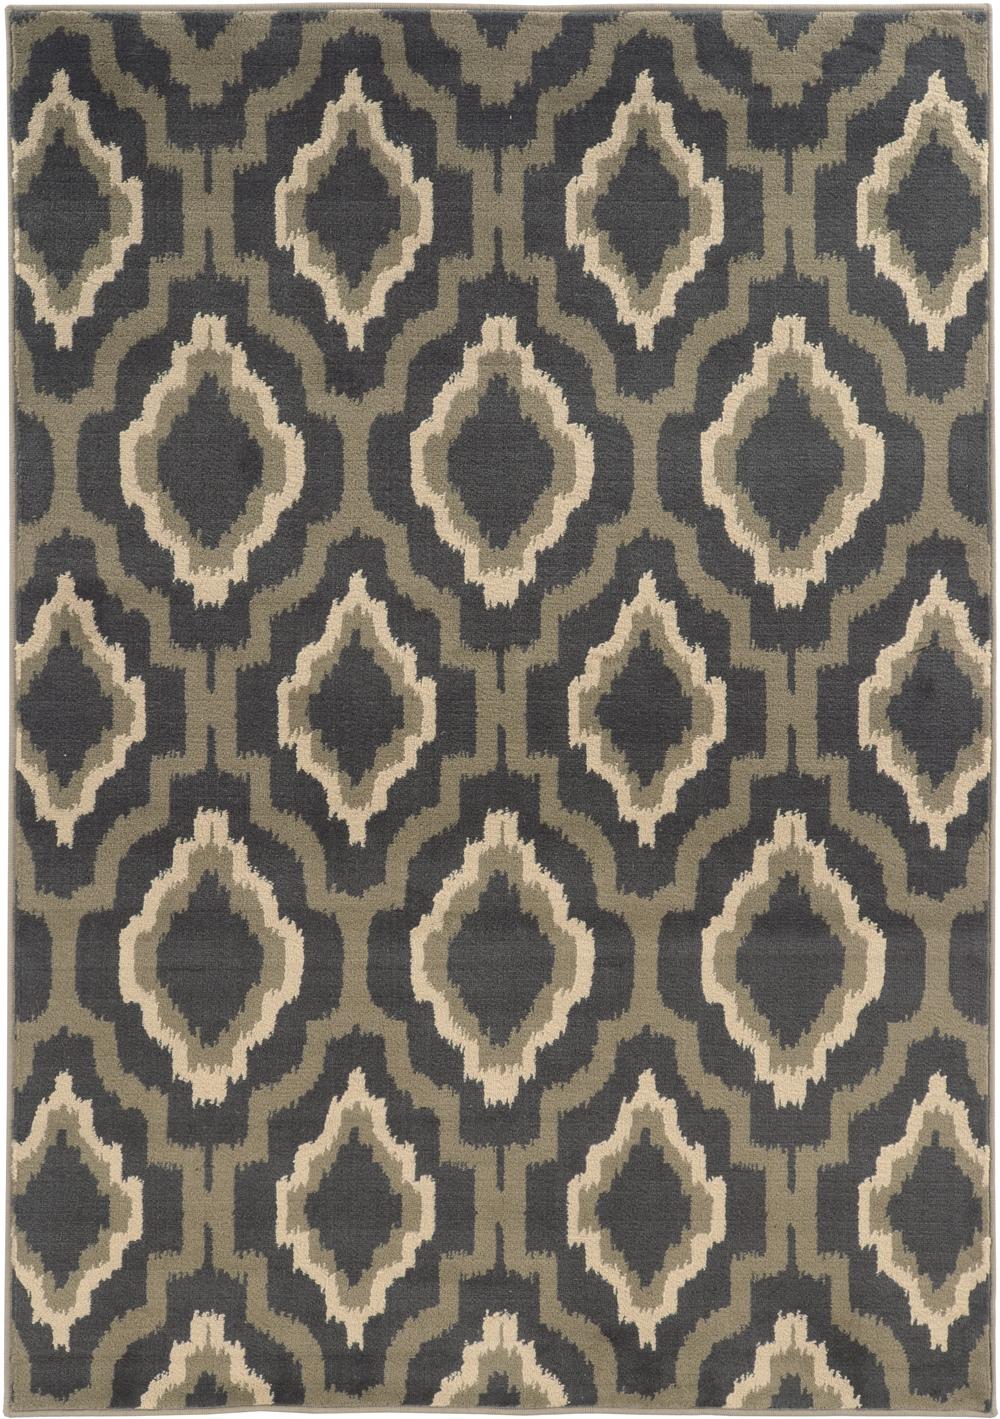 Oriental Weavers BRENTWOOD 5501D Charcoal Rug